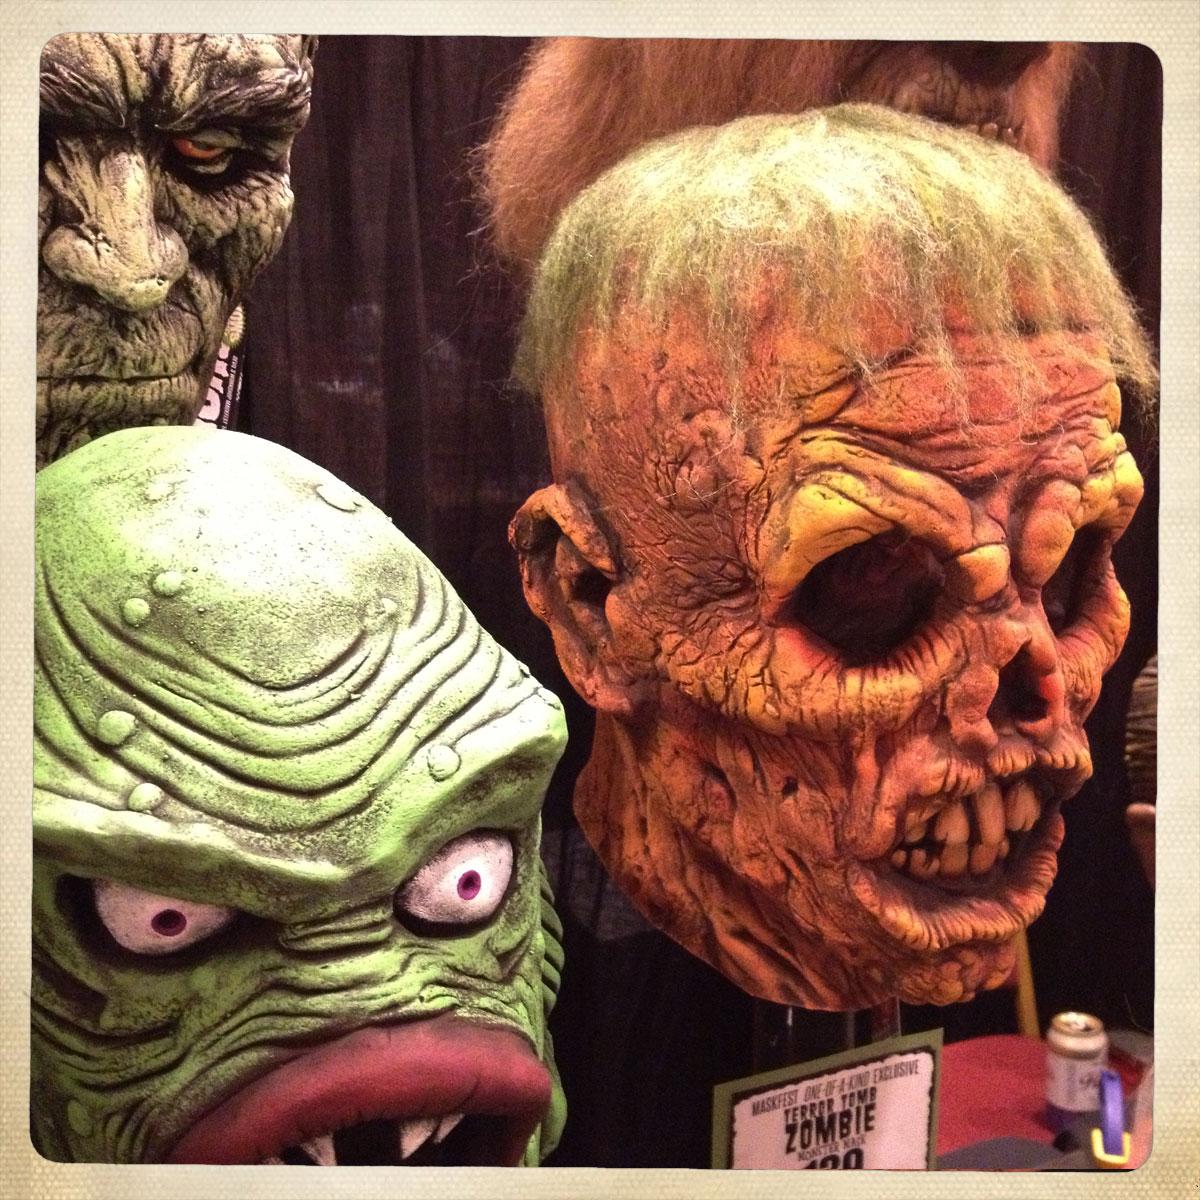 http://monstermasks.blogspot.com/2014/09/personal-maskfest-14-recap.html